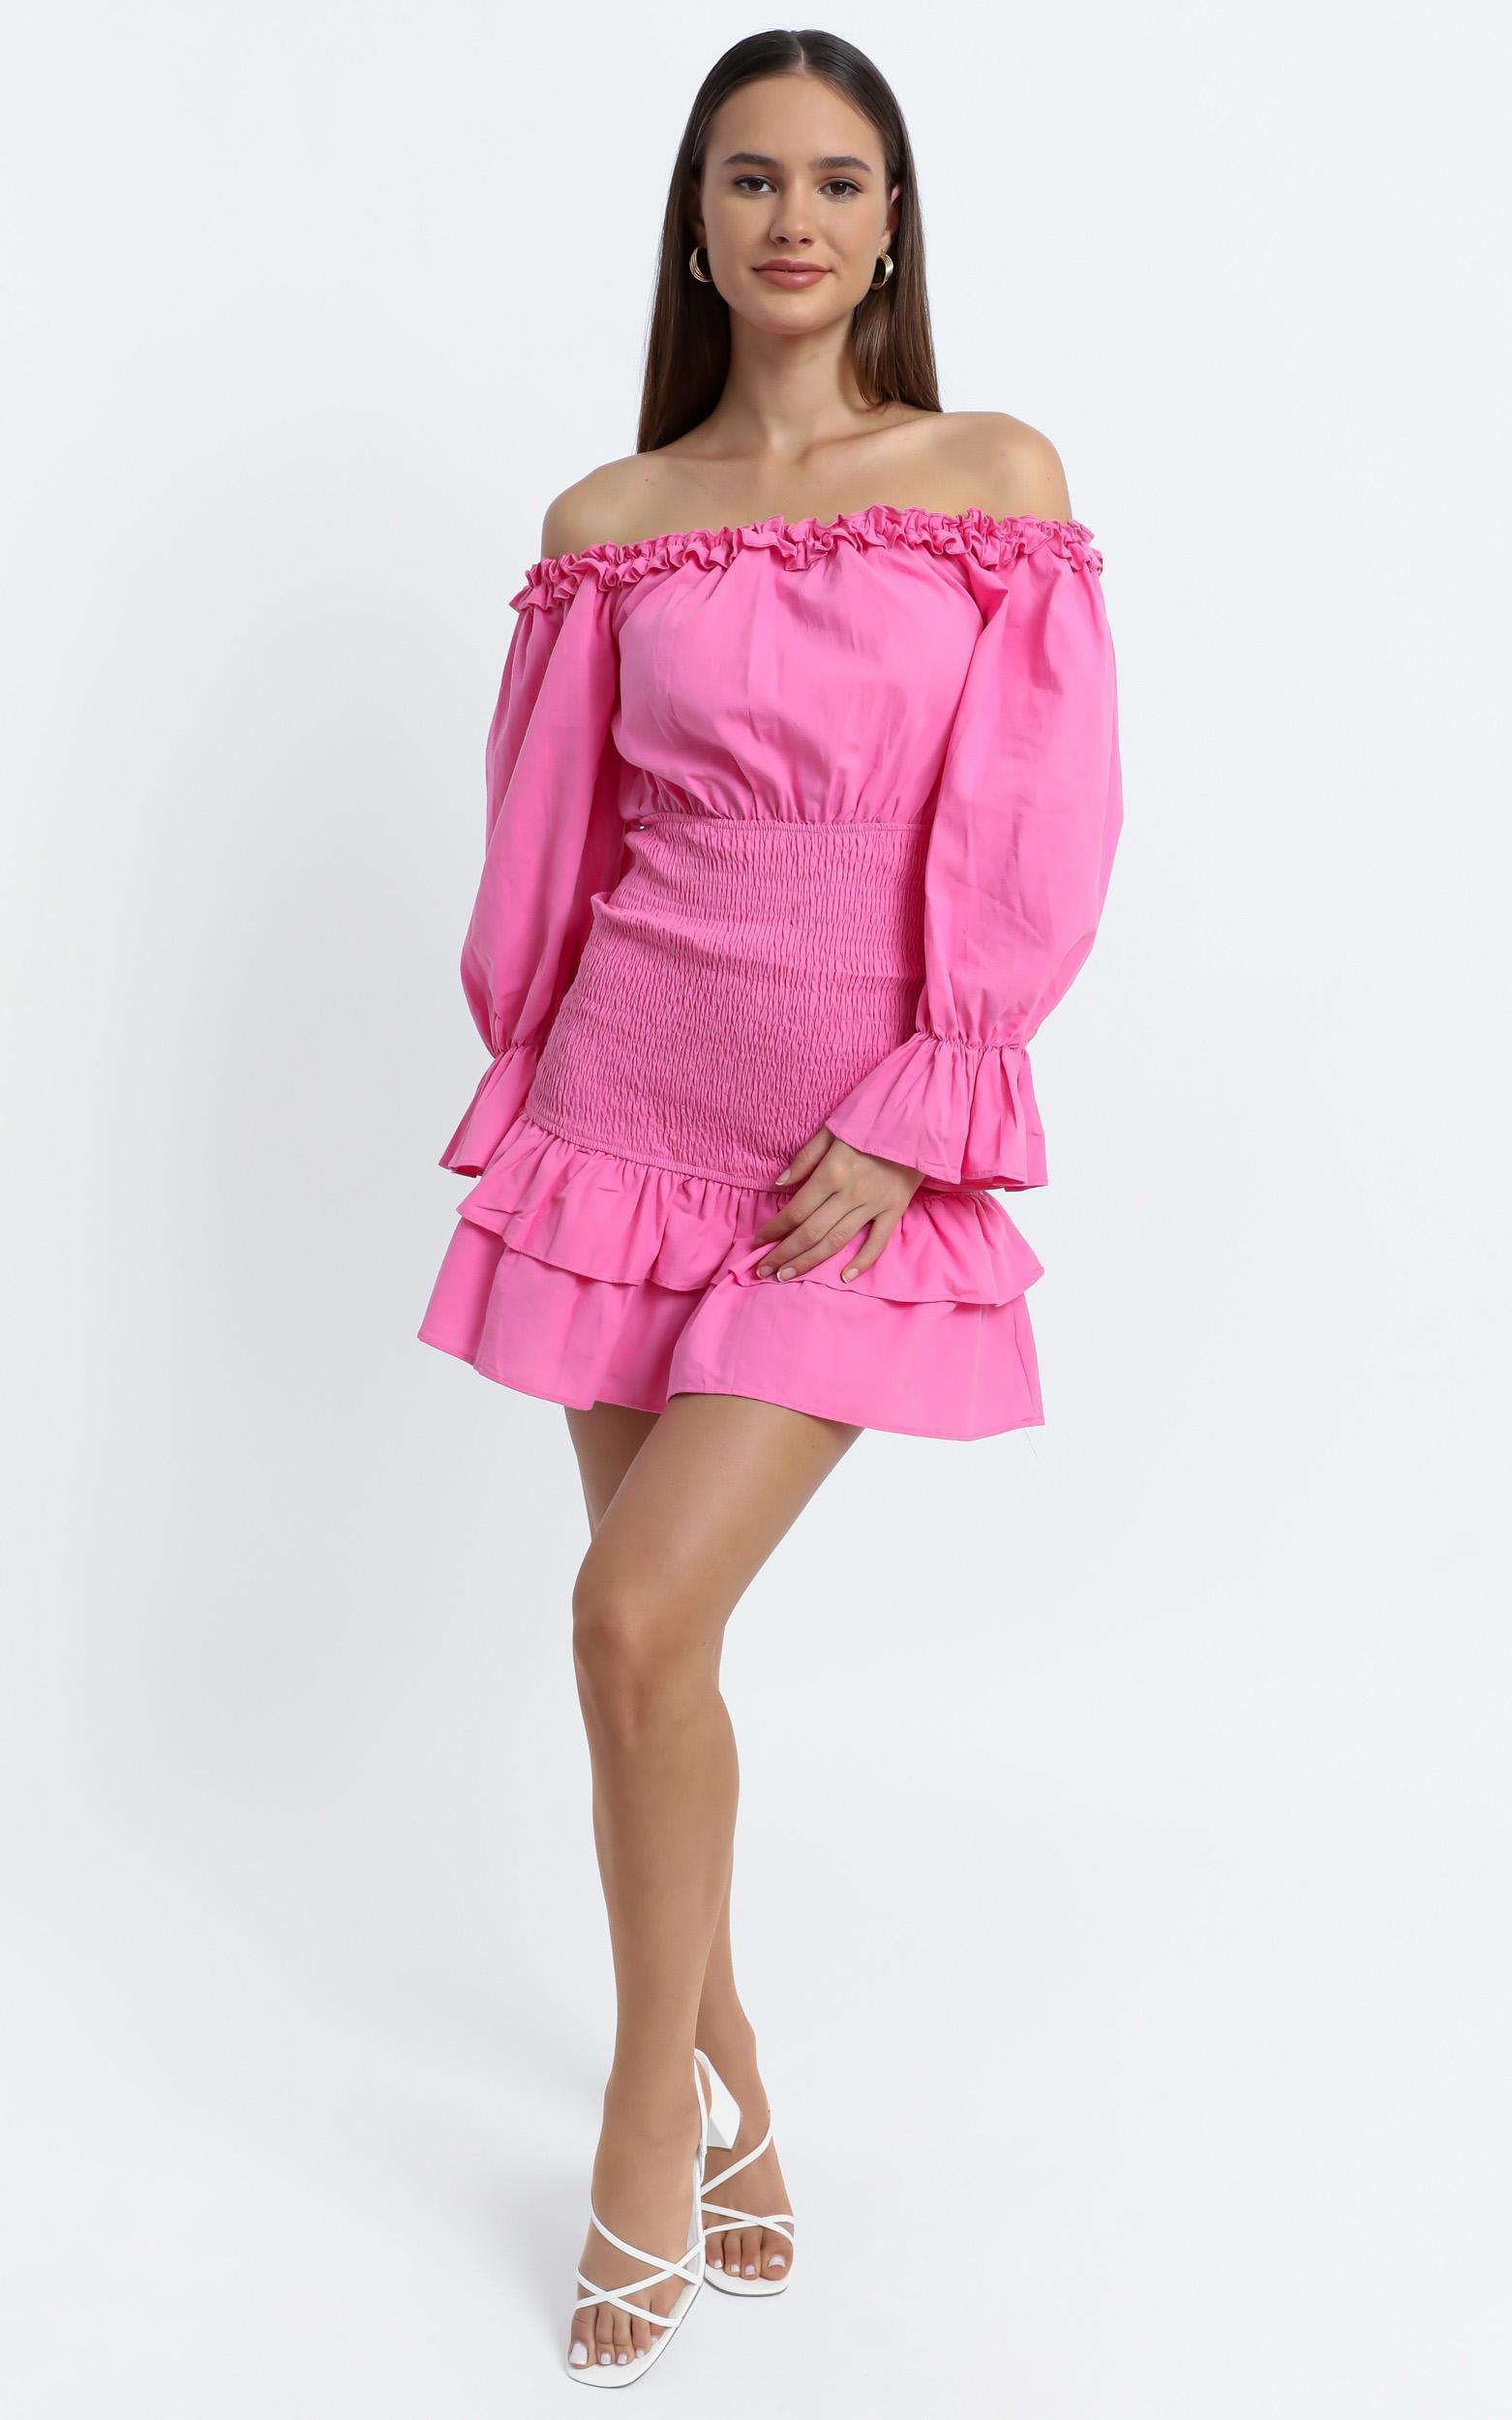 Lizabeth Dress in Hot Pink - 6 (XS), Pink, hi-res image number null